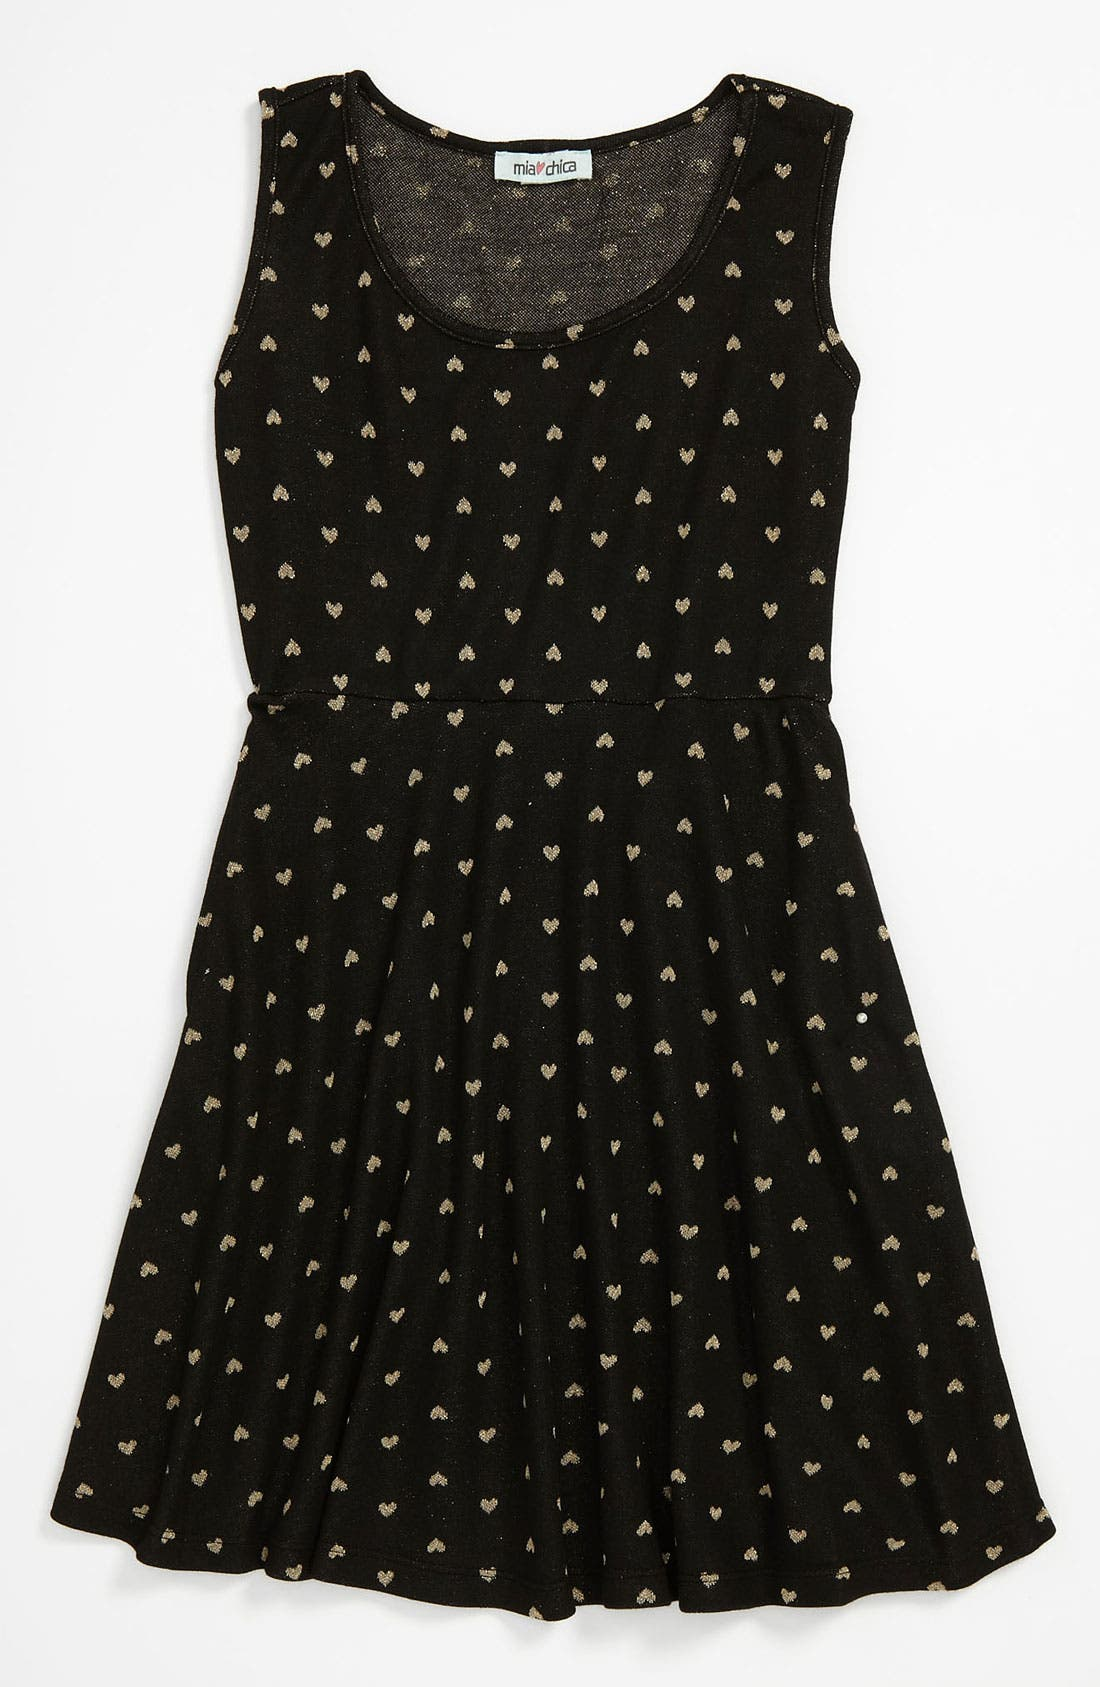 Alternate Image 1 Selected - Mia Chica 'Heart' Dress (Big Girls)